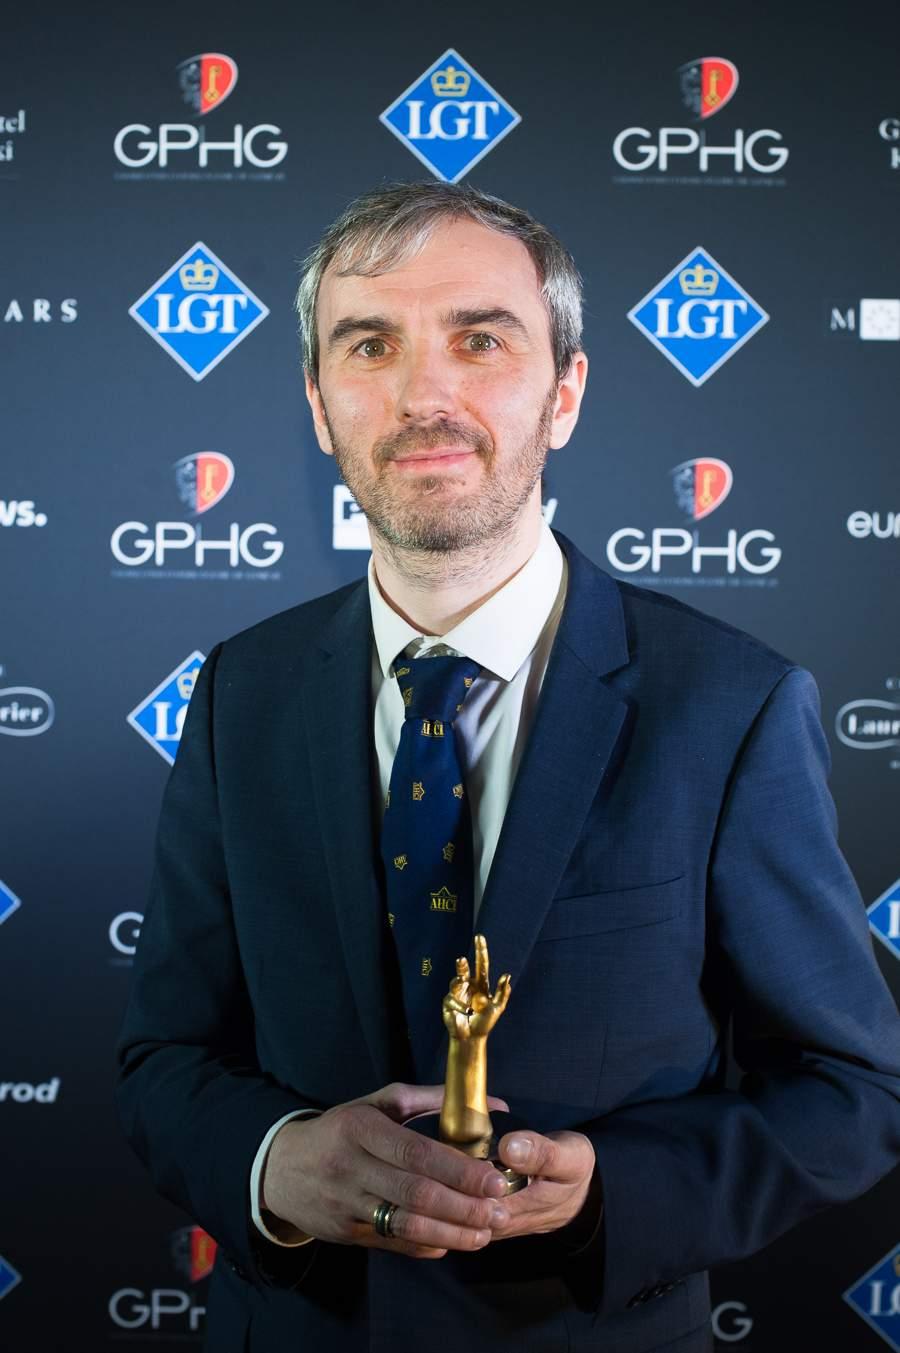 Konstantin Chaykin, Founder, winner of Audacity Prize 2018